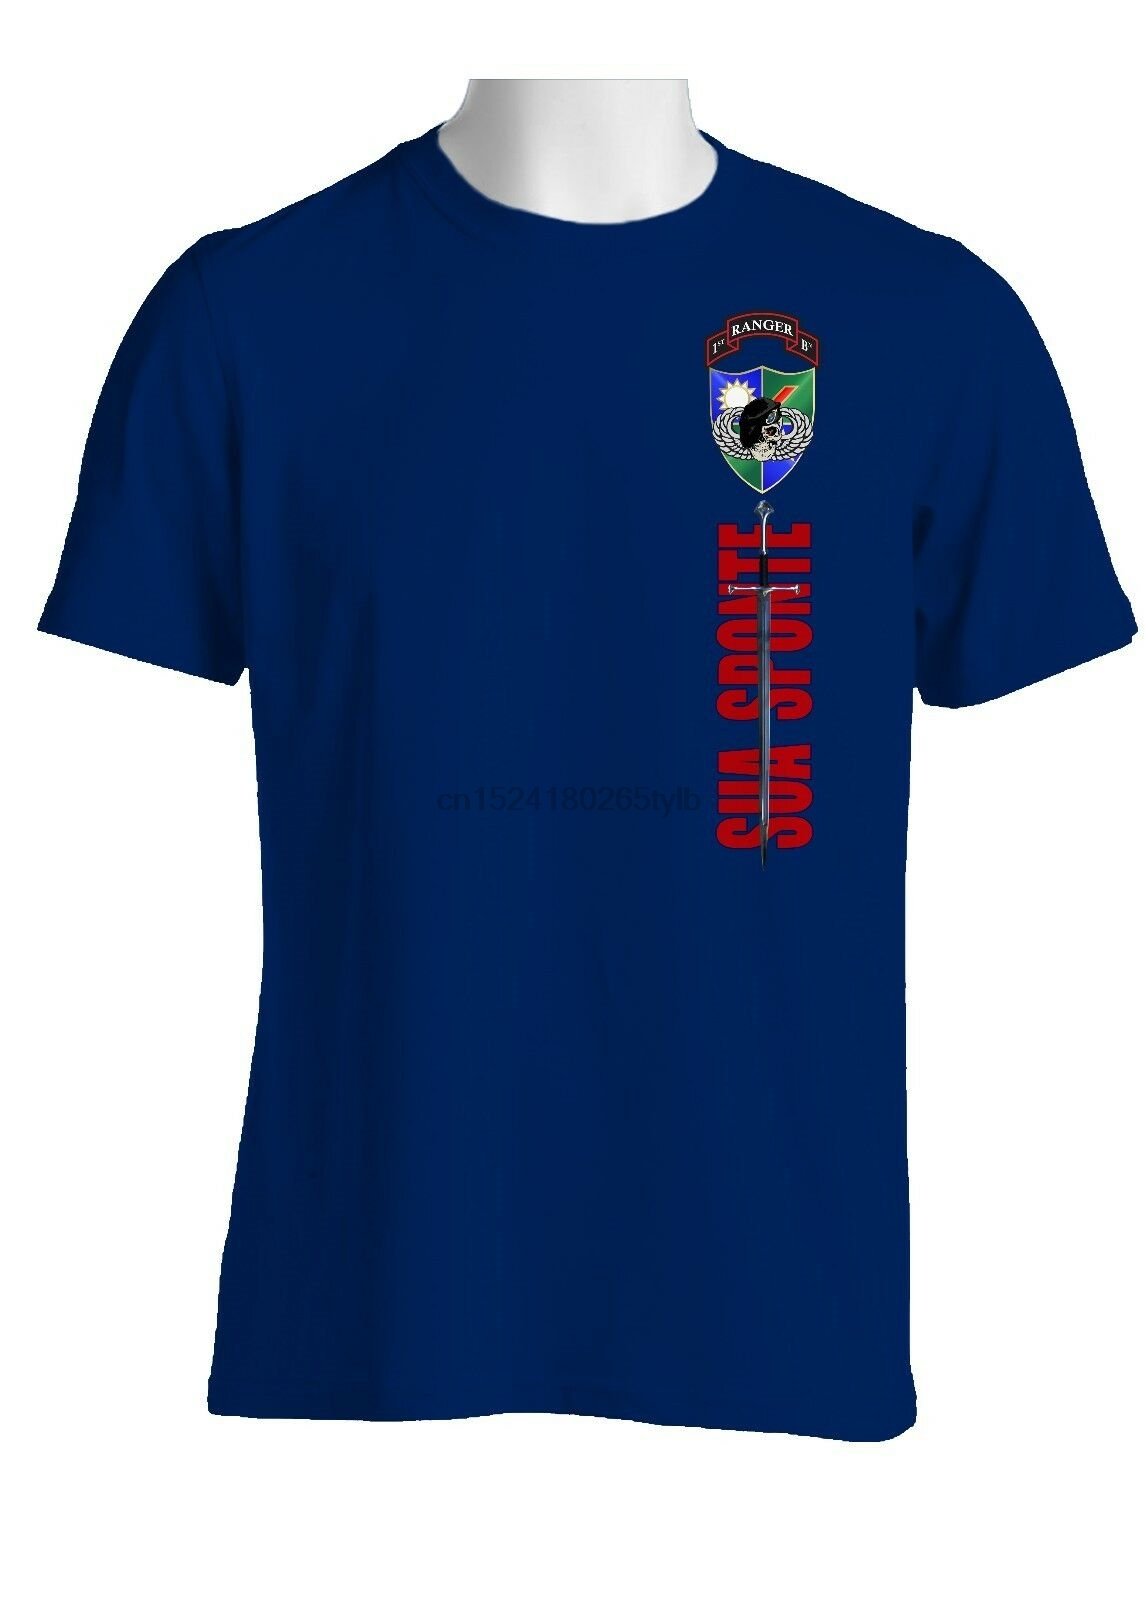 1-75th Ranger Battalion (Black Beret) Sword of St. Michael Cotton Shirt-1567